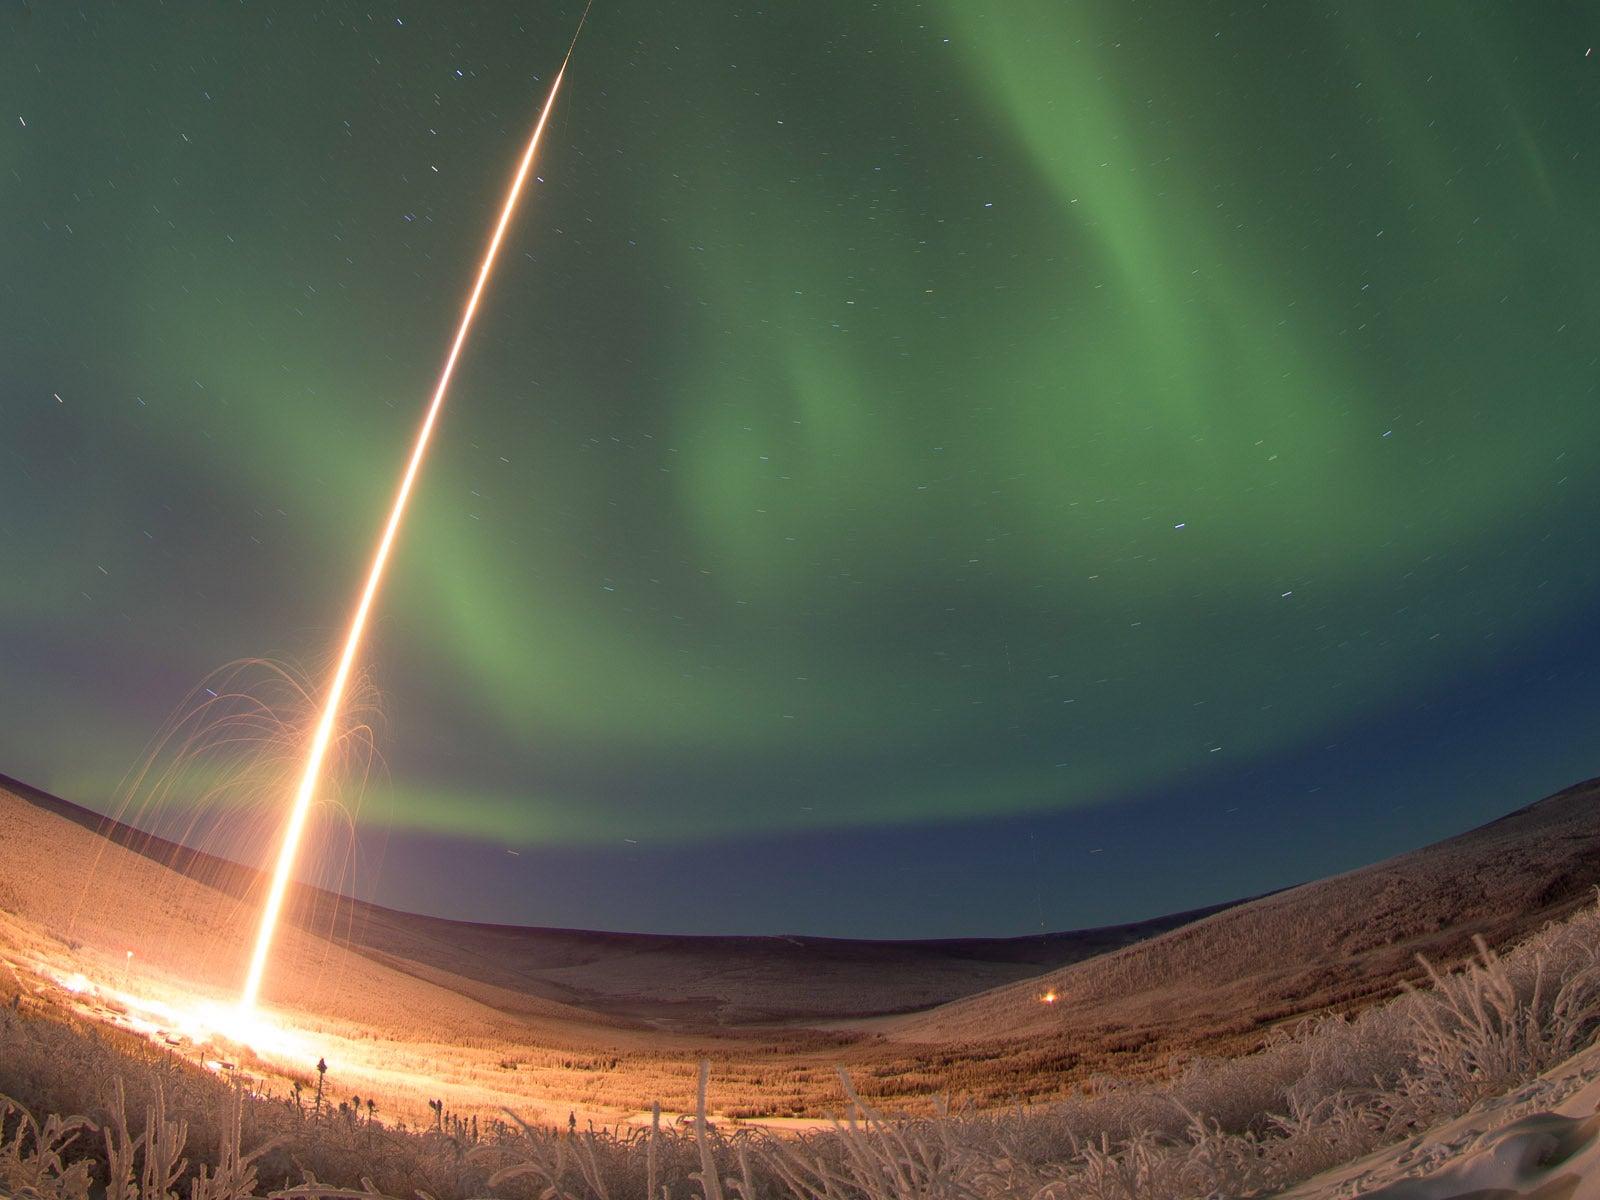 Watch A Rocket Blast Off Into An Aurora [Video]